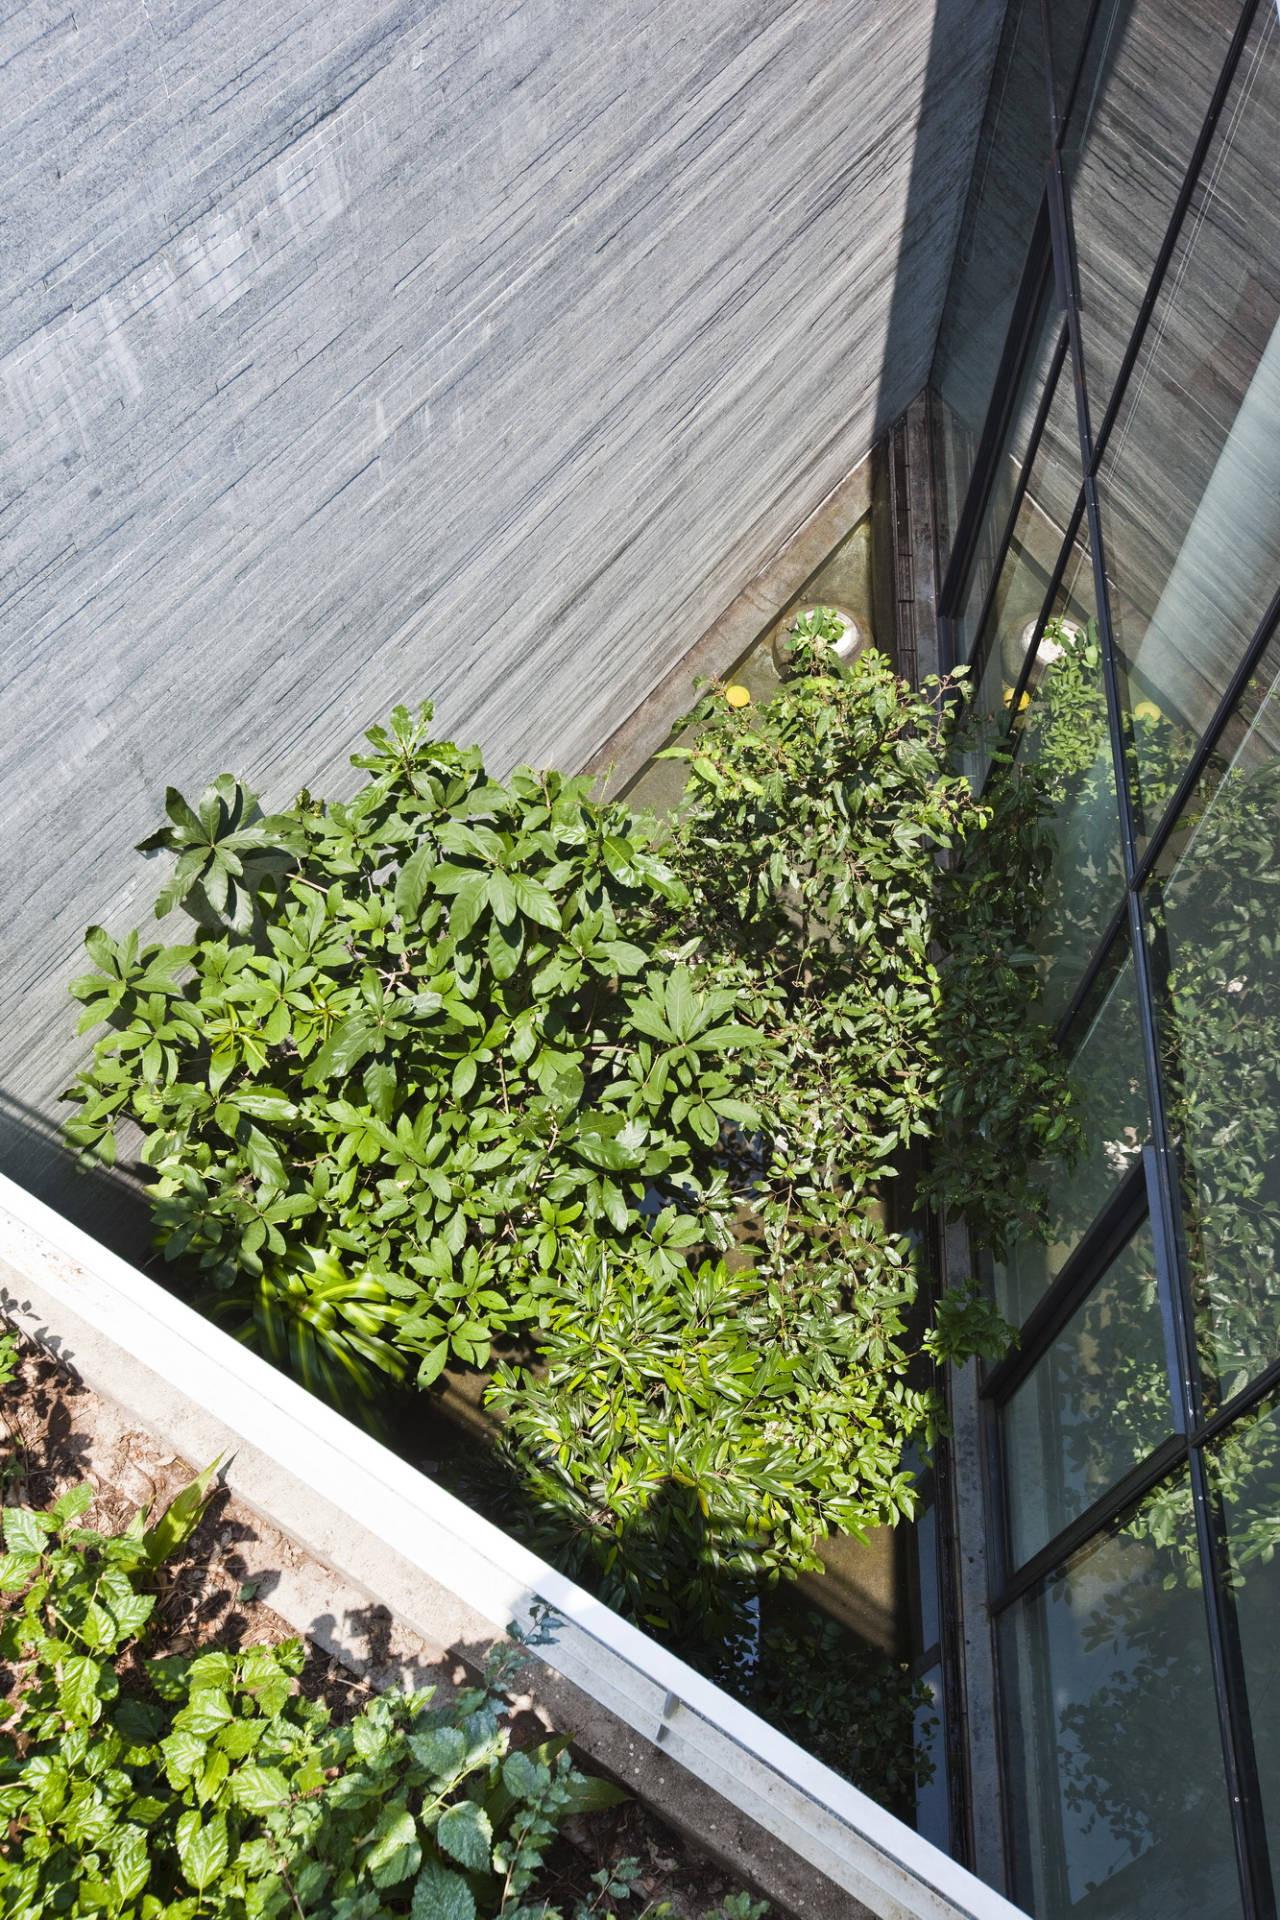 Gia Lai House Vo Trong Nghia Architects ArchDaily Enchanting Stacking Green Vo Trong Nghia Daisuke Sanuki Shunri Nishizawa